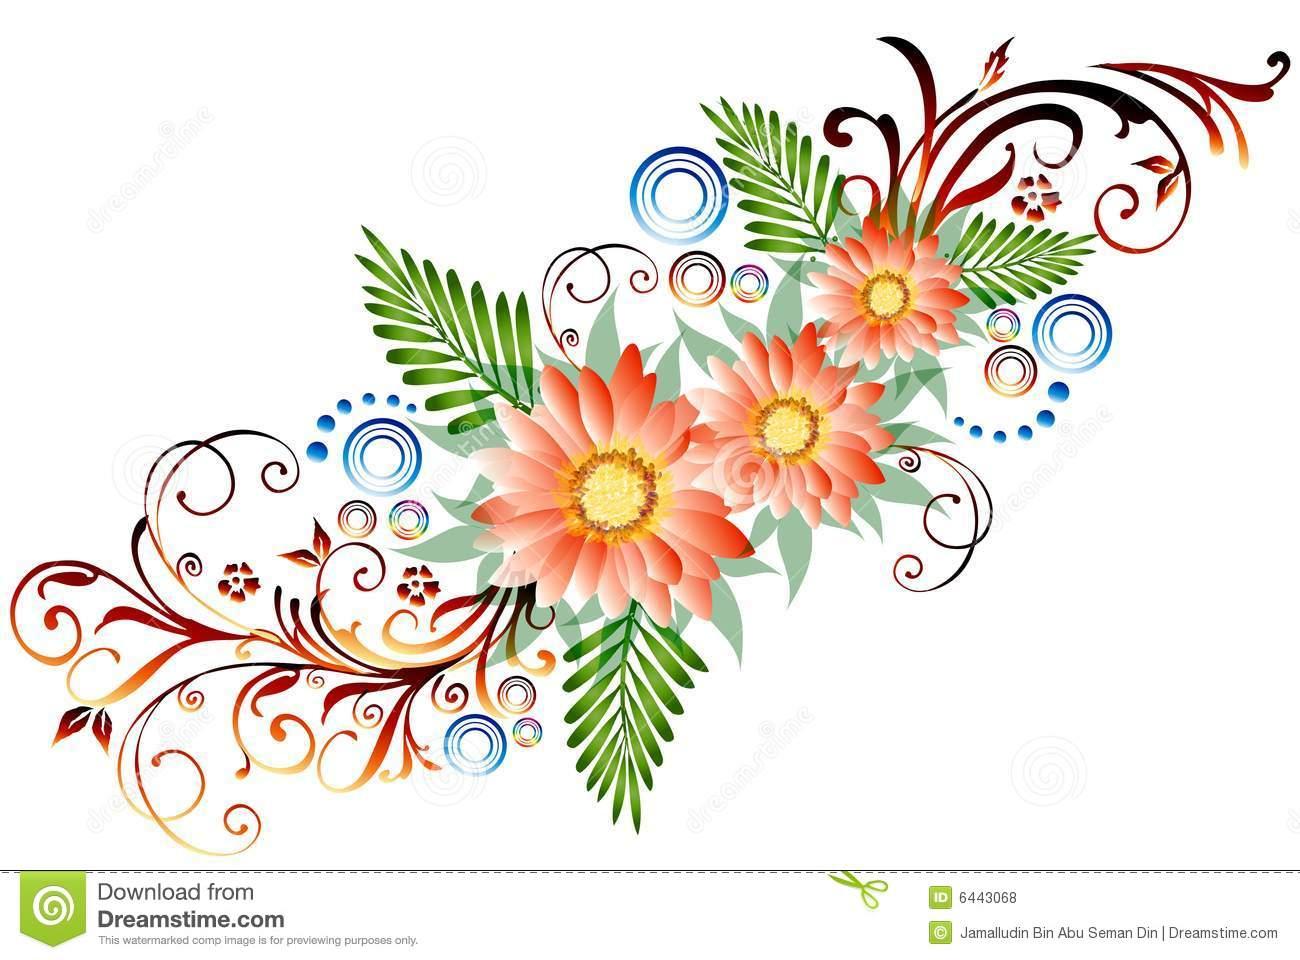 1300x960 Flower Border Drawing Floral Border Stock Illustration. Image